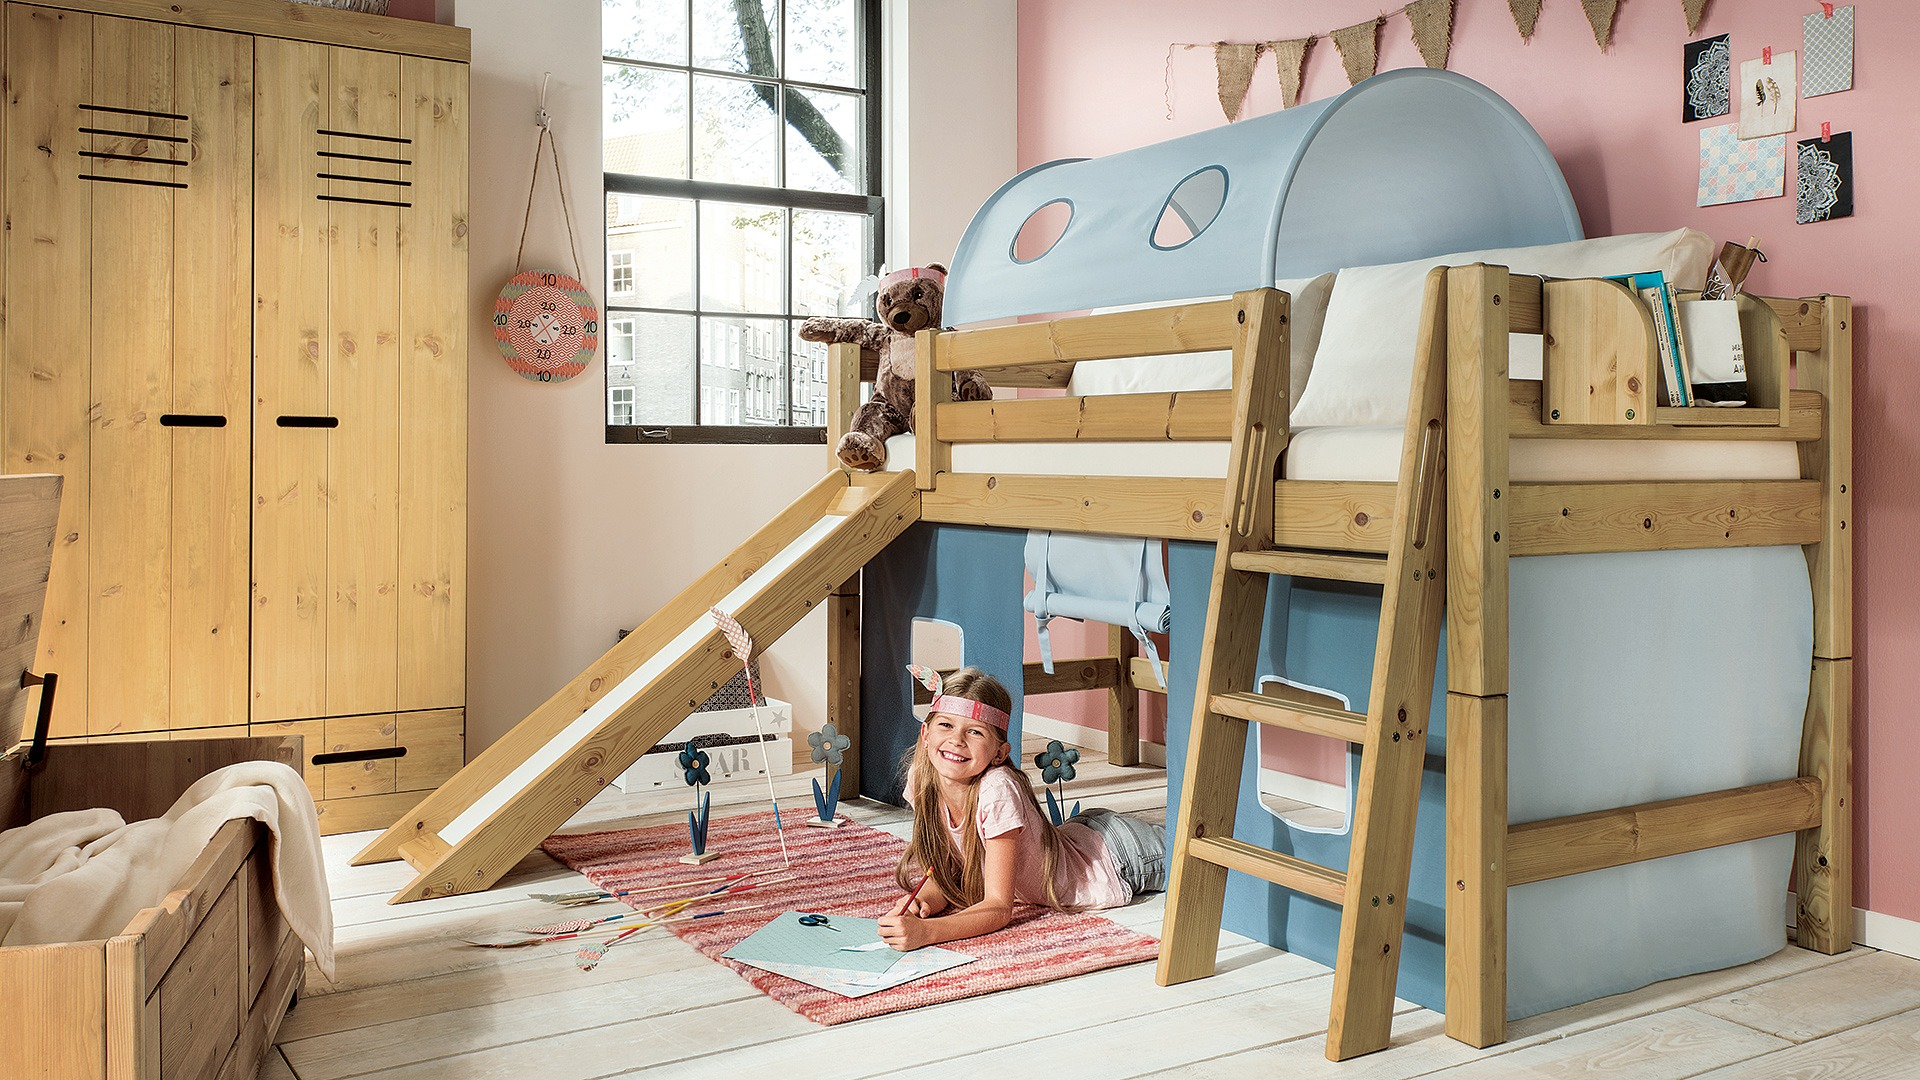 Full Size of Mini Hochbett In 4 Tollen Varianten Regal Kinderzimmer Weiß Sofa Regale Kinderzimmer Kinderzimmer Hochbett